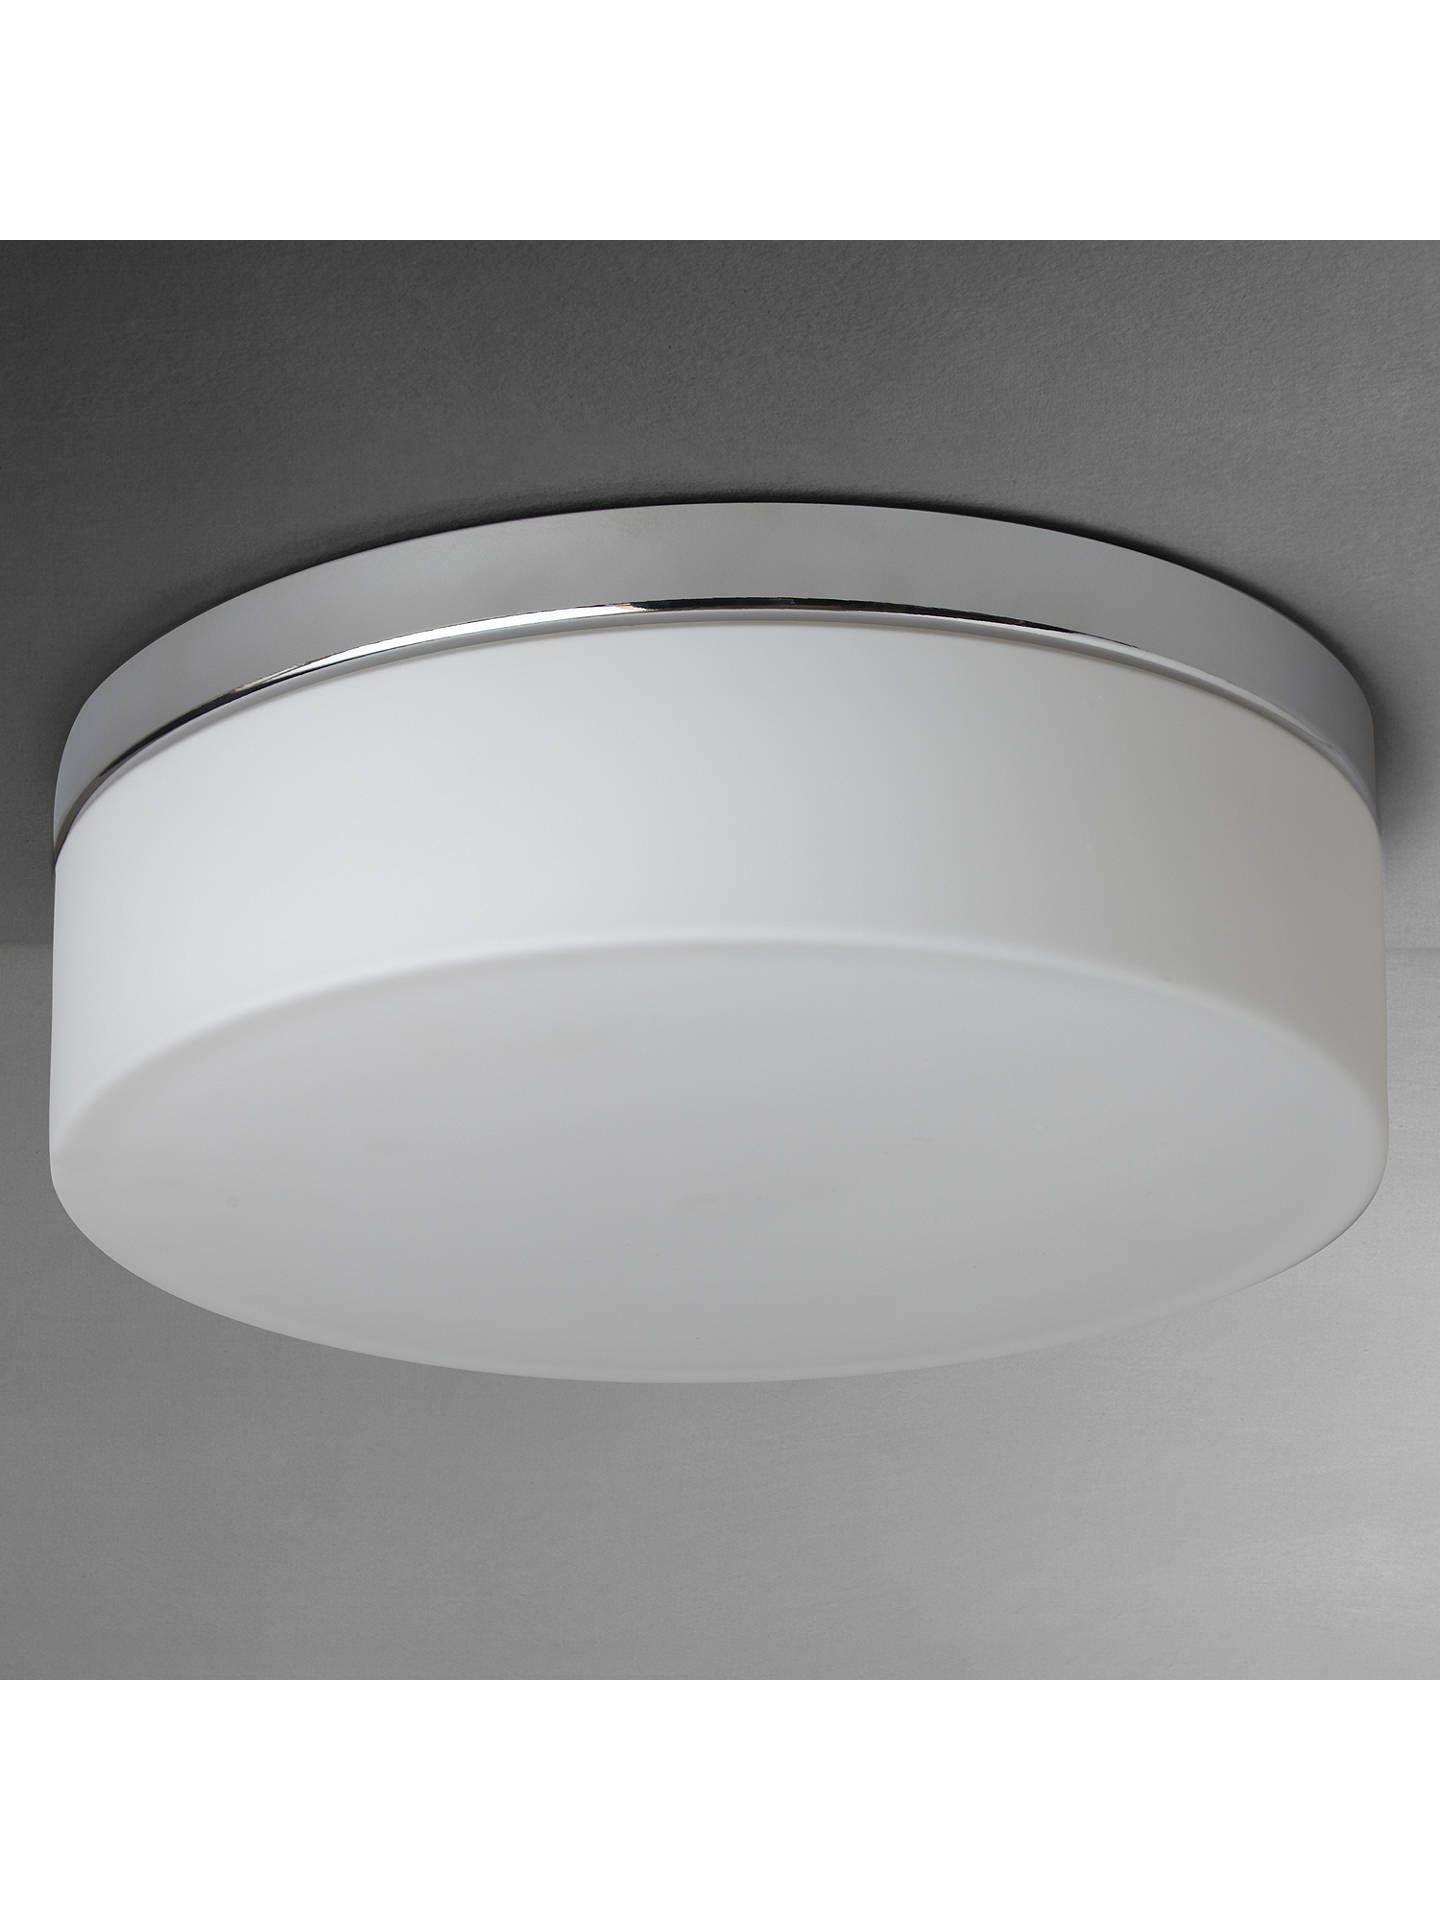 Astro Sabina Round Flush Bathroom Ceiling Light Bathroom Ceiling Light Ceiling Lights Ceiling